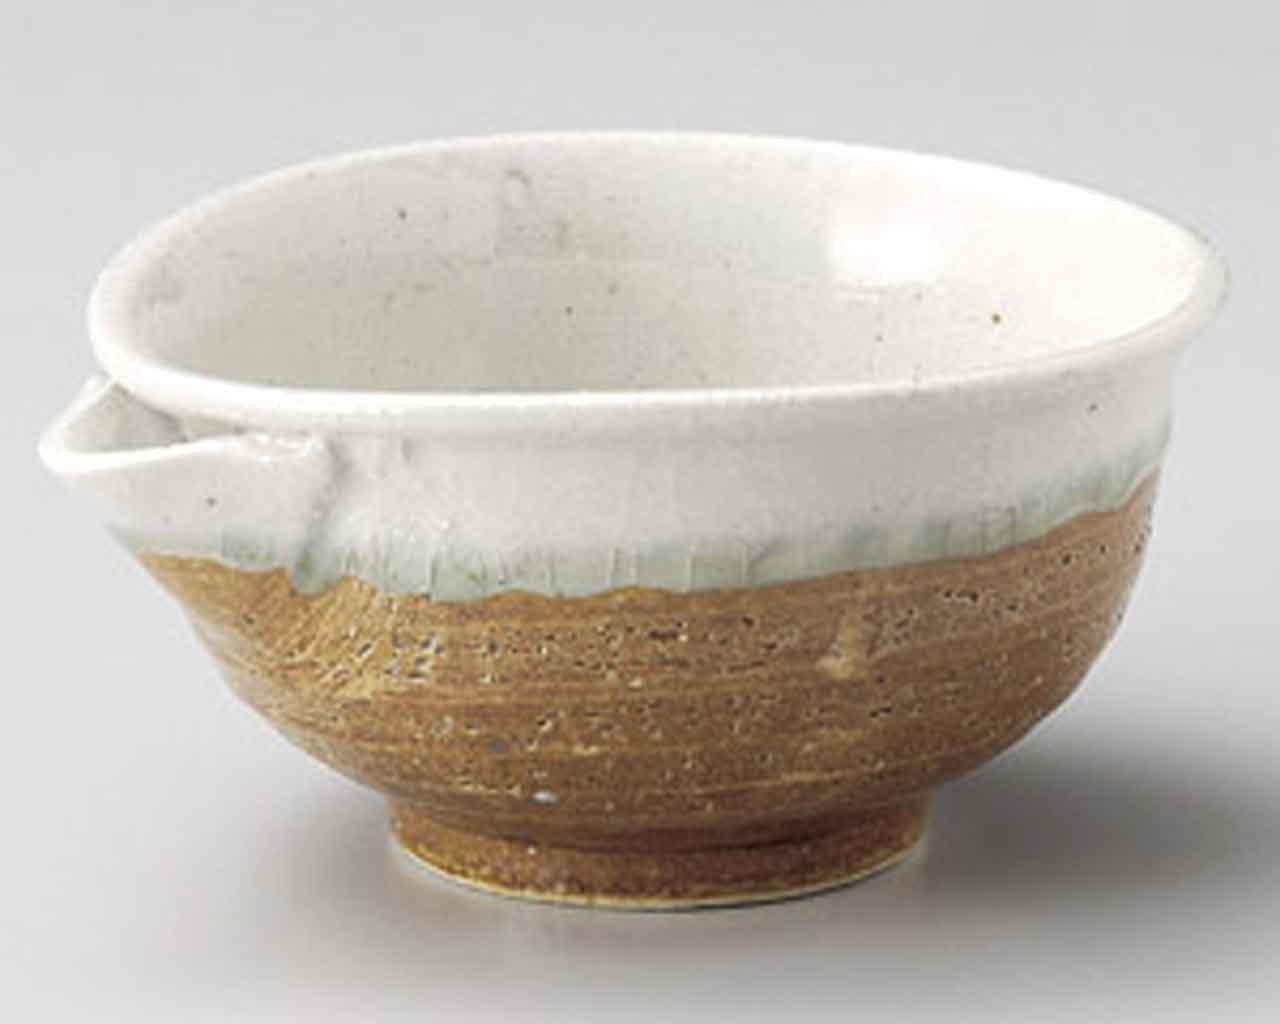 Iga White Nagashi 5.5inch Set of 10 Small Bowls Beige Ceramic Made in Japan